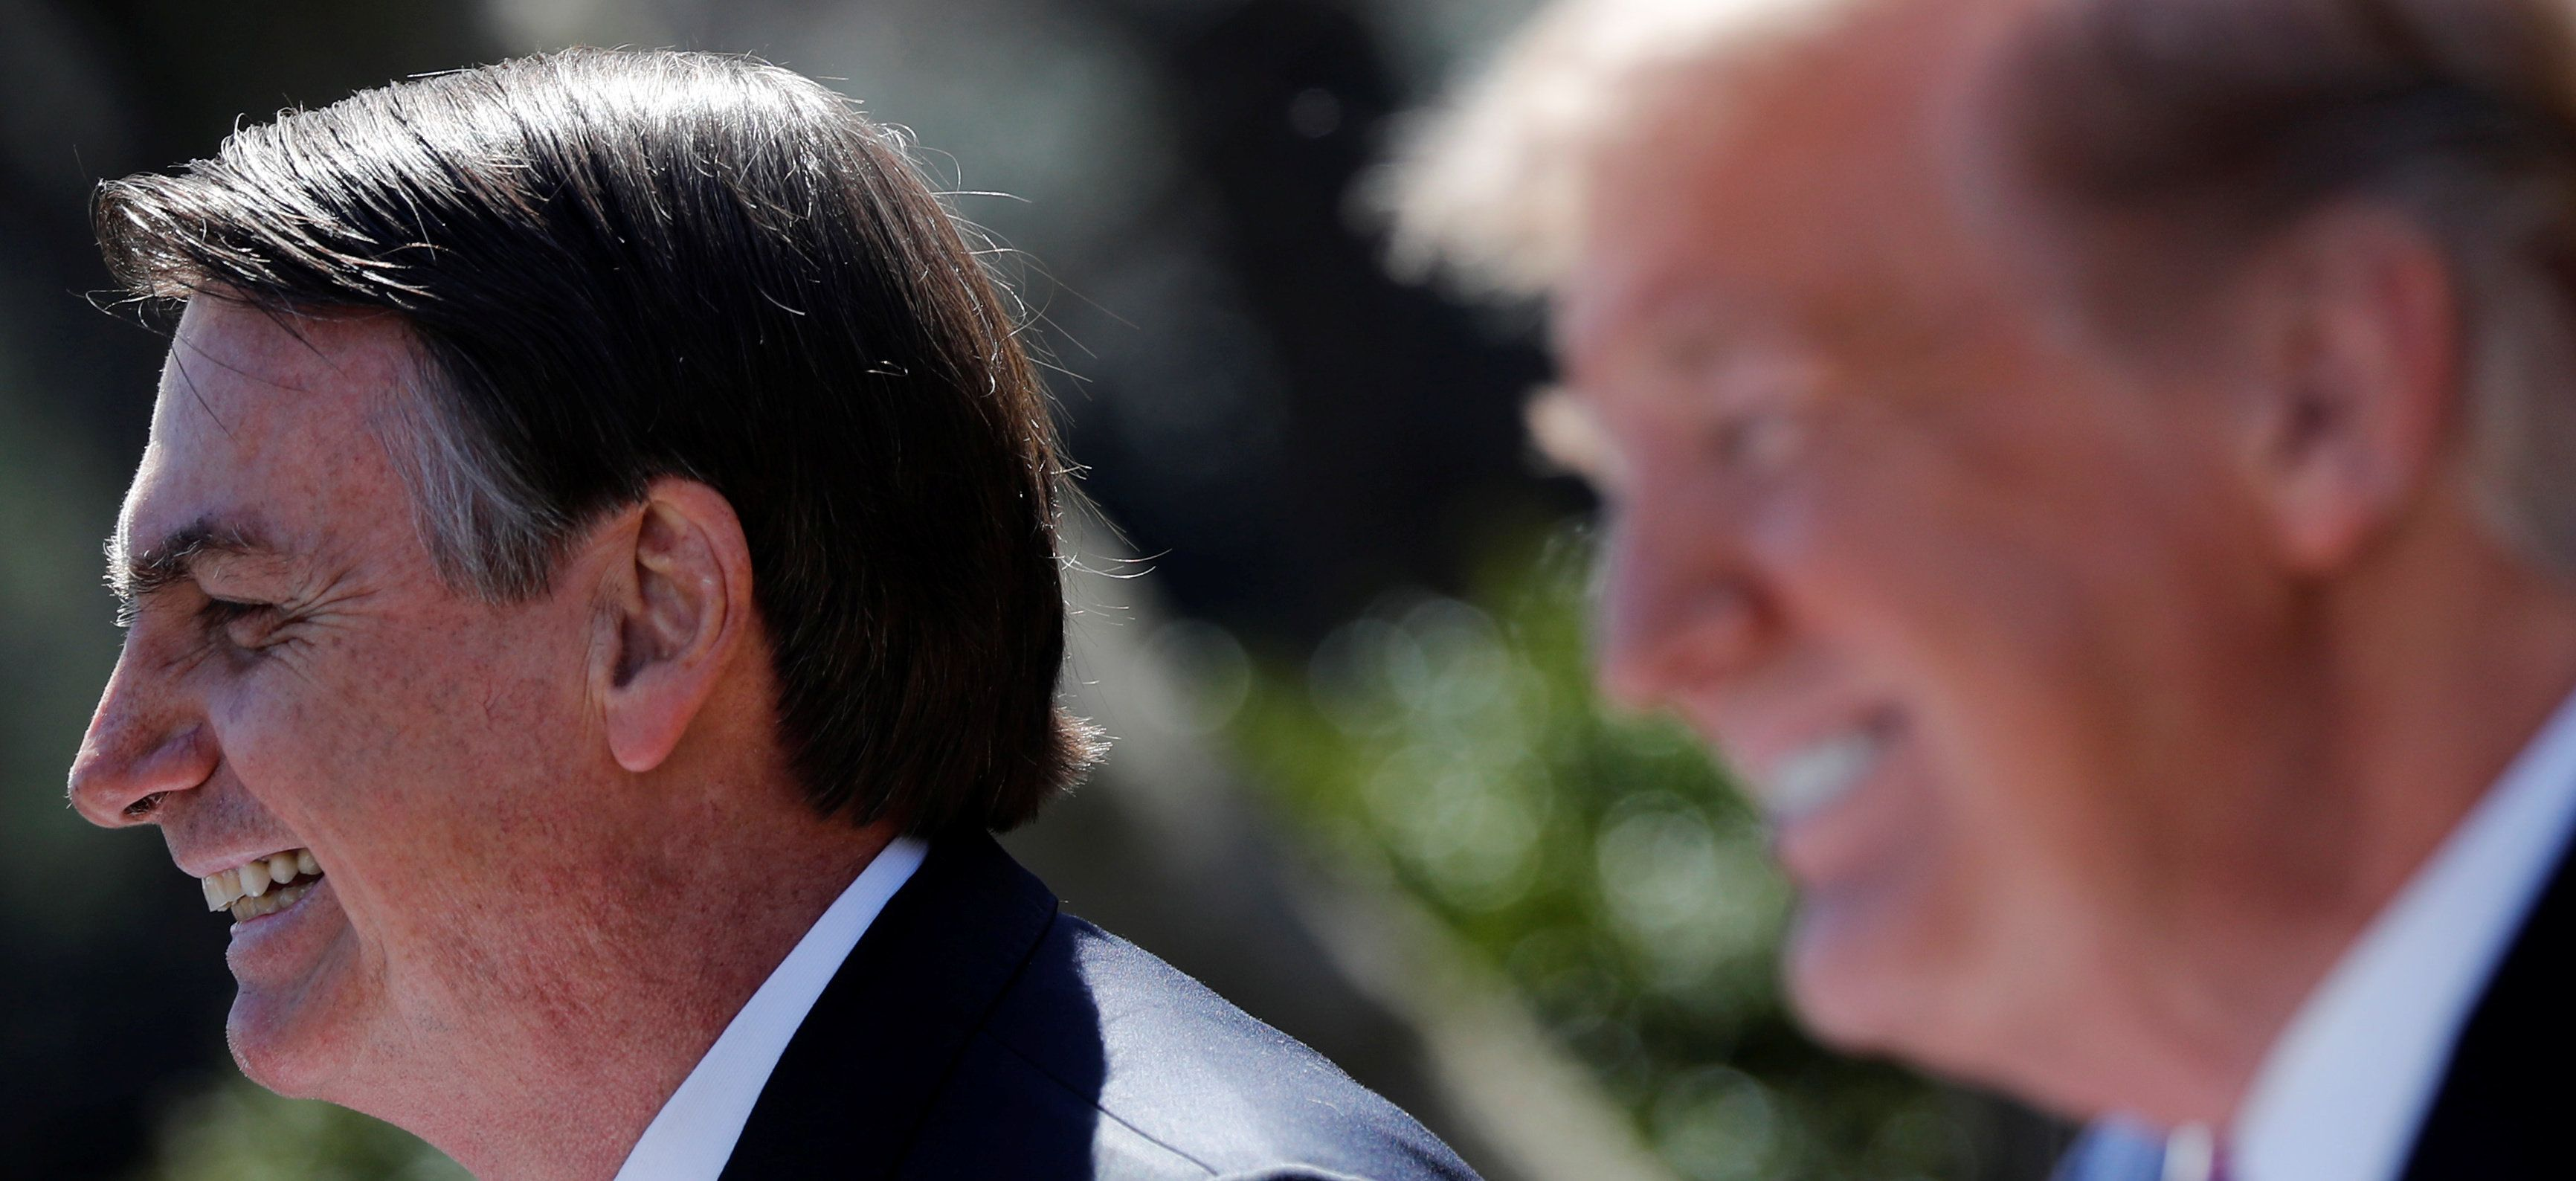 O presidente dos Estados Unidos Donald Trump prometeu a Jair Bolsonaro apoio à entrada do Brasil...